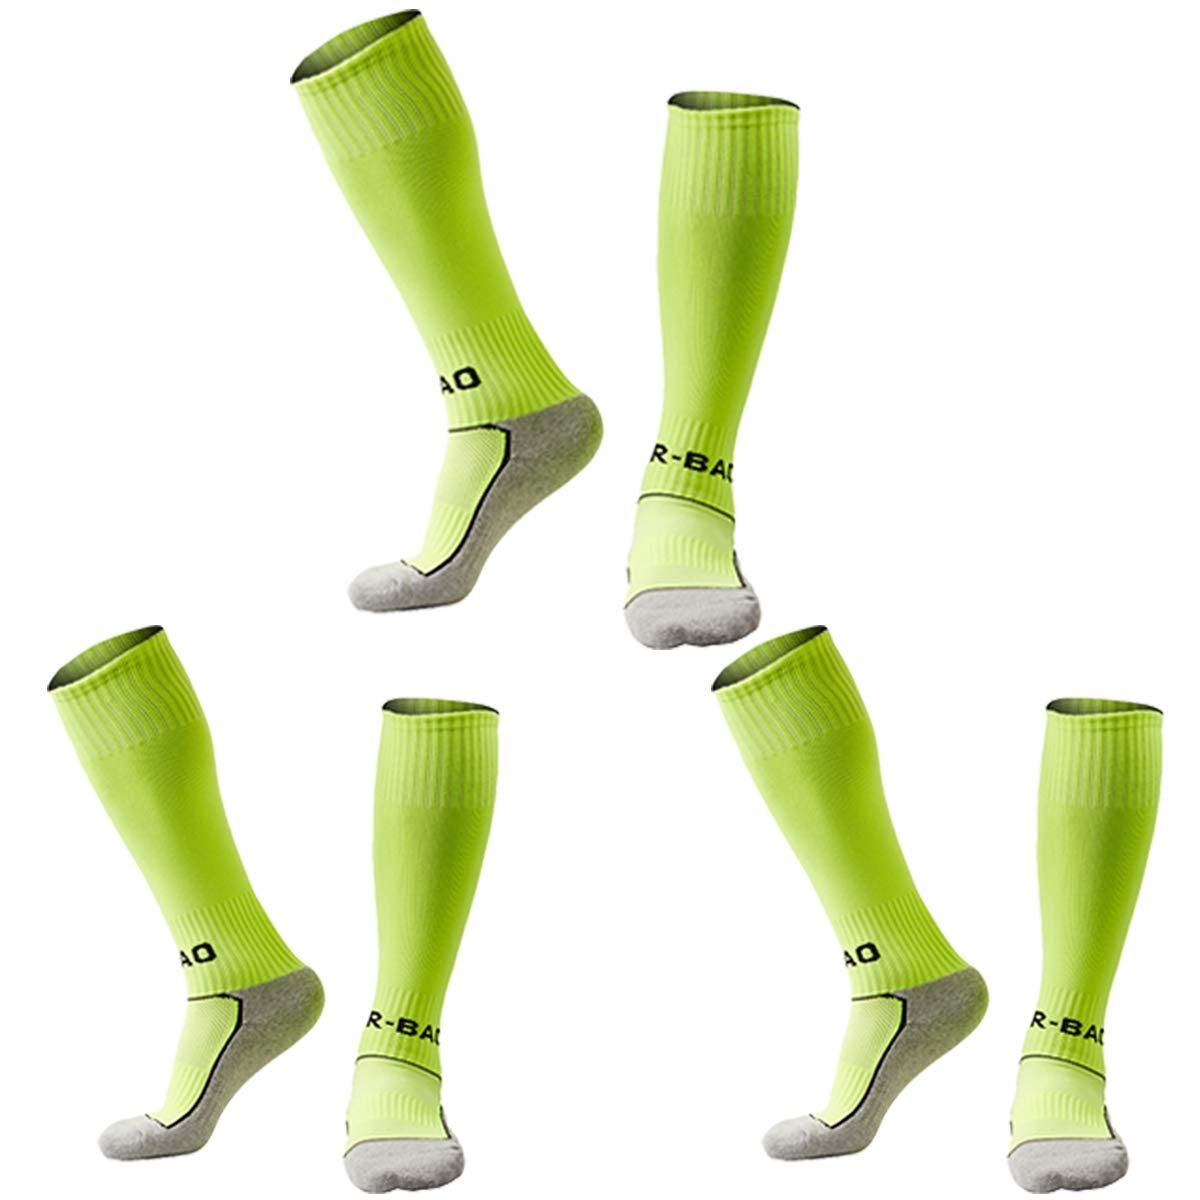 Soccer Socks Little Kids Boys Knee High Comfortable Cotton Team Sports Socks 3 Pack Lime Green XS by KALAKIDS